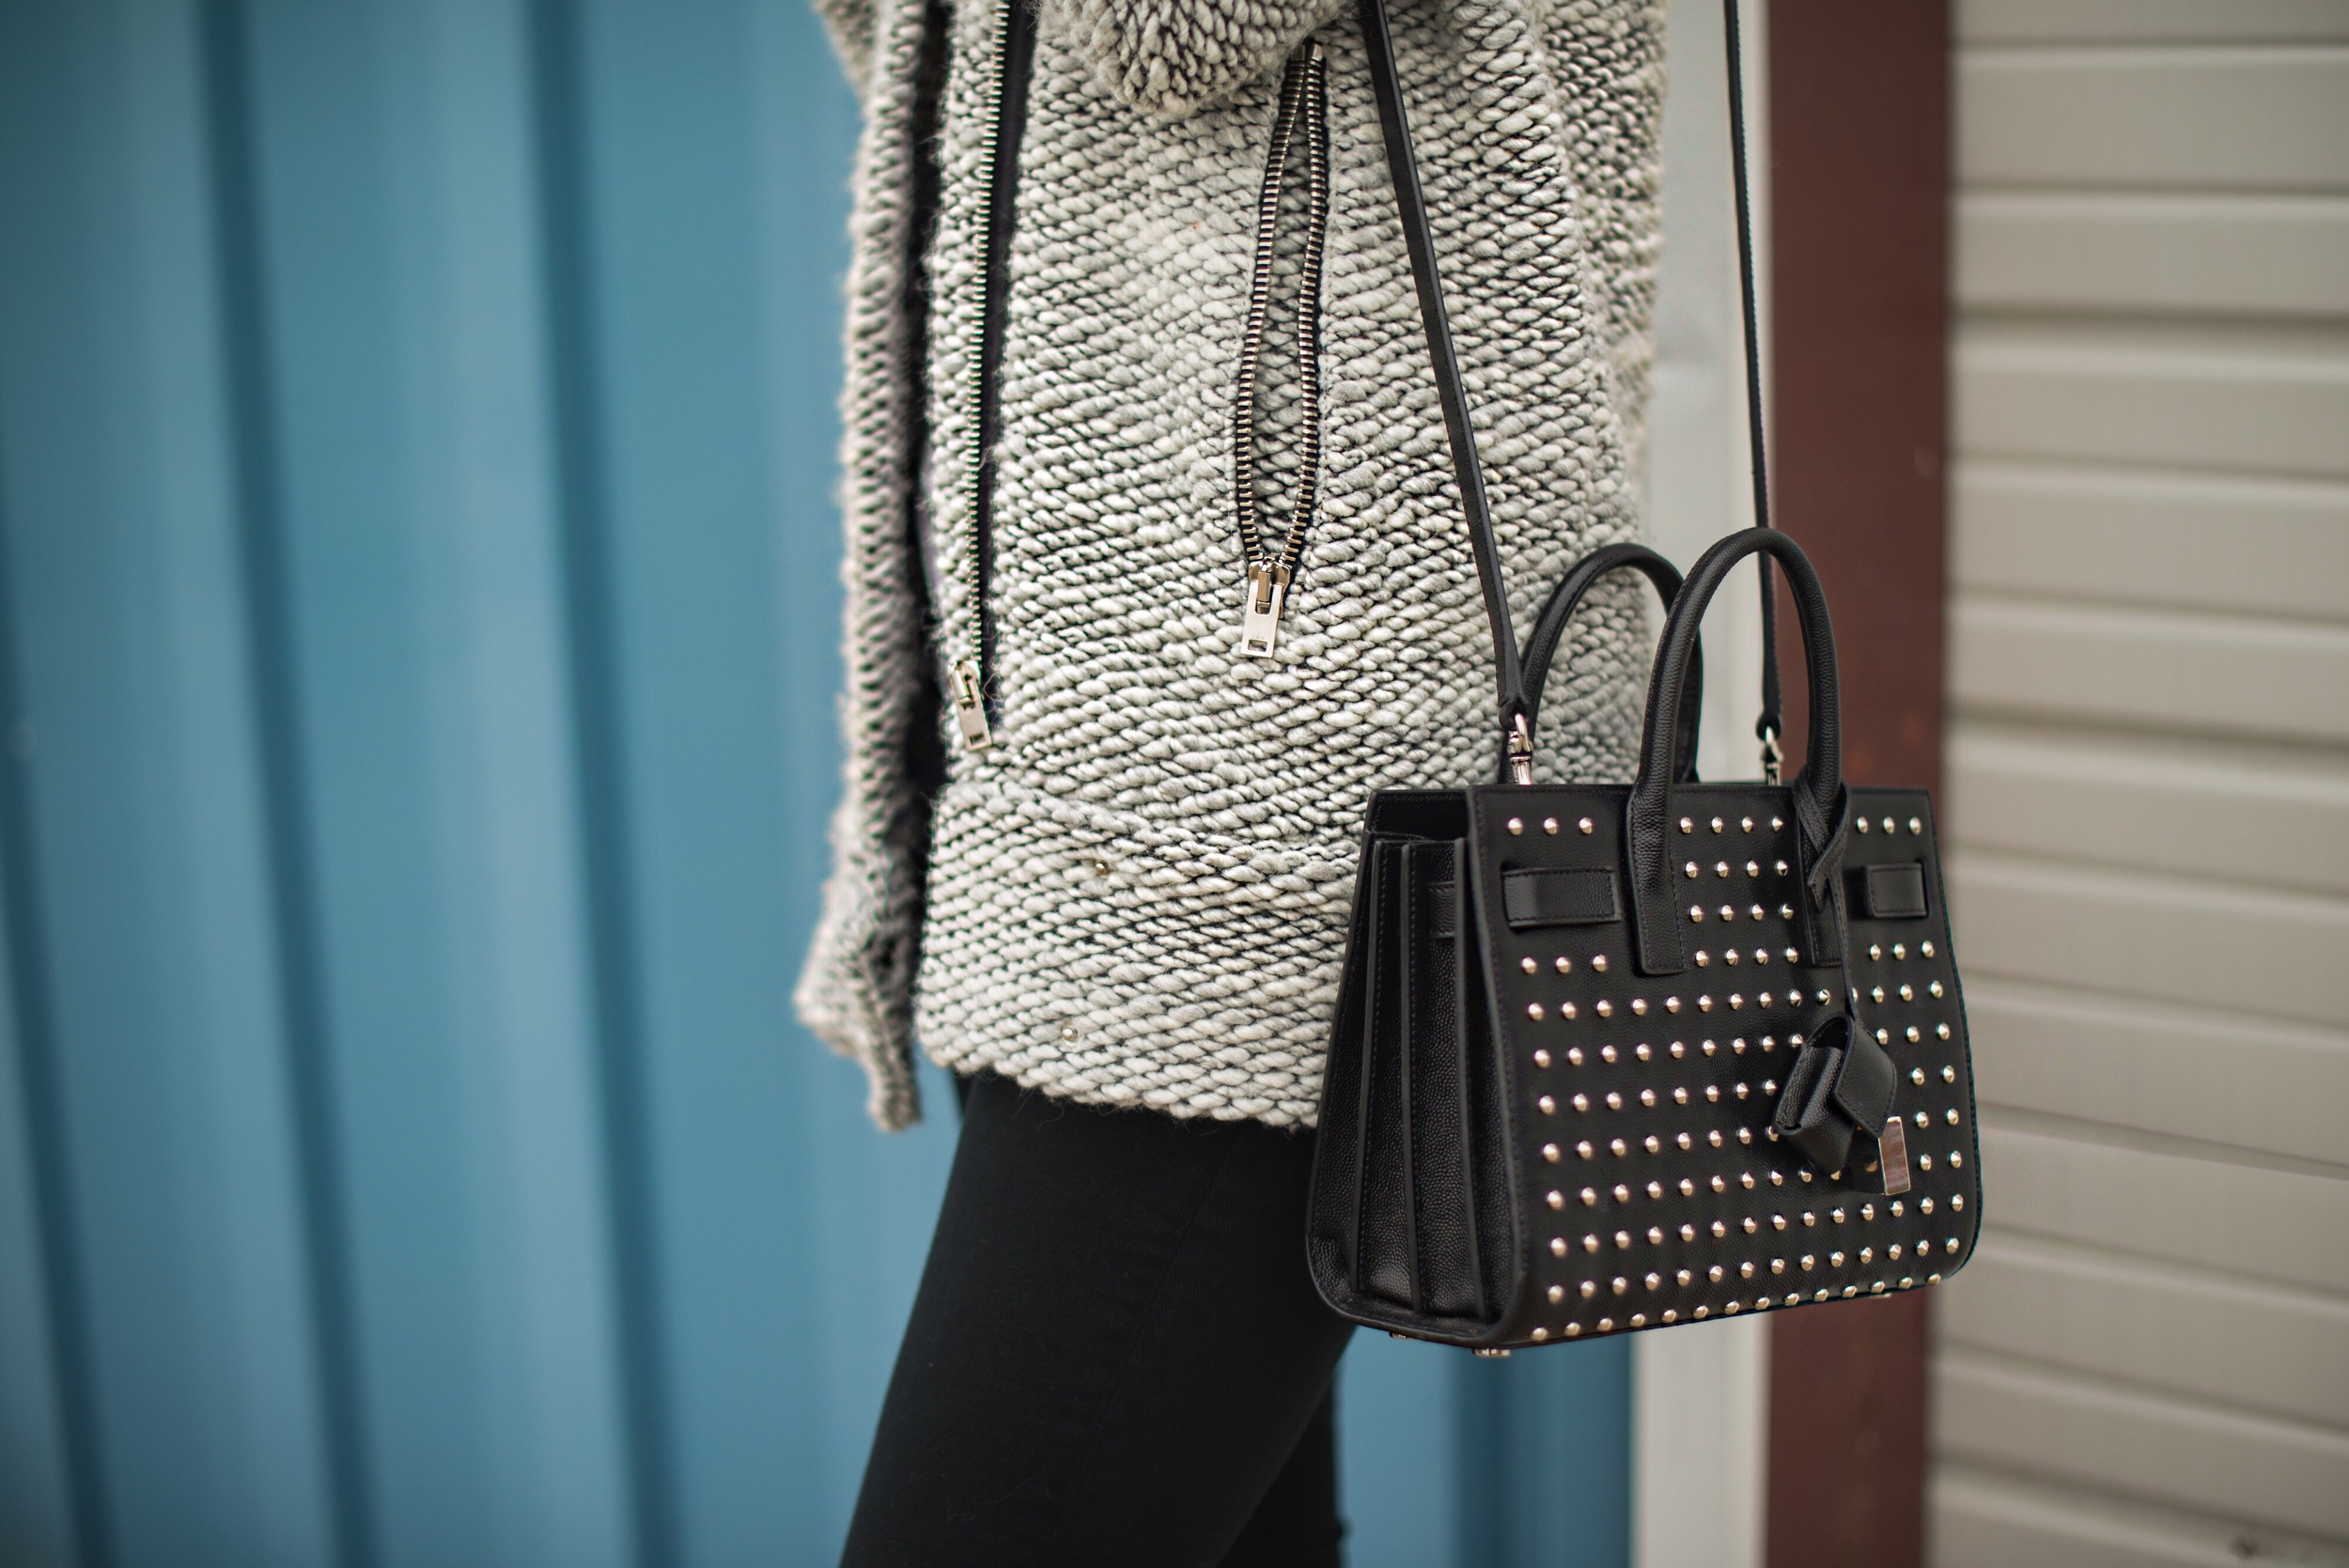 Sweater - IRO     Jeans - Topshop     Bag - Saint Laurent     Boots - Miista      photos by Blythe Thomas